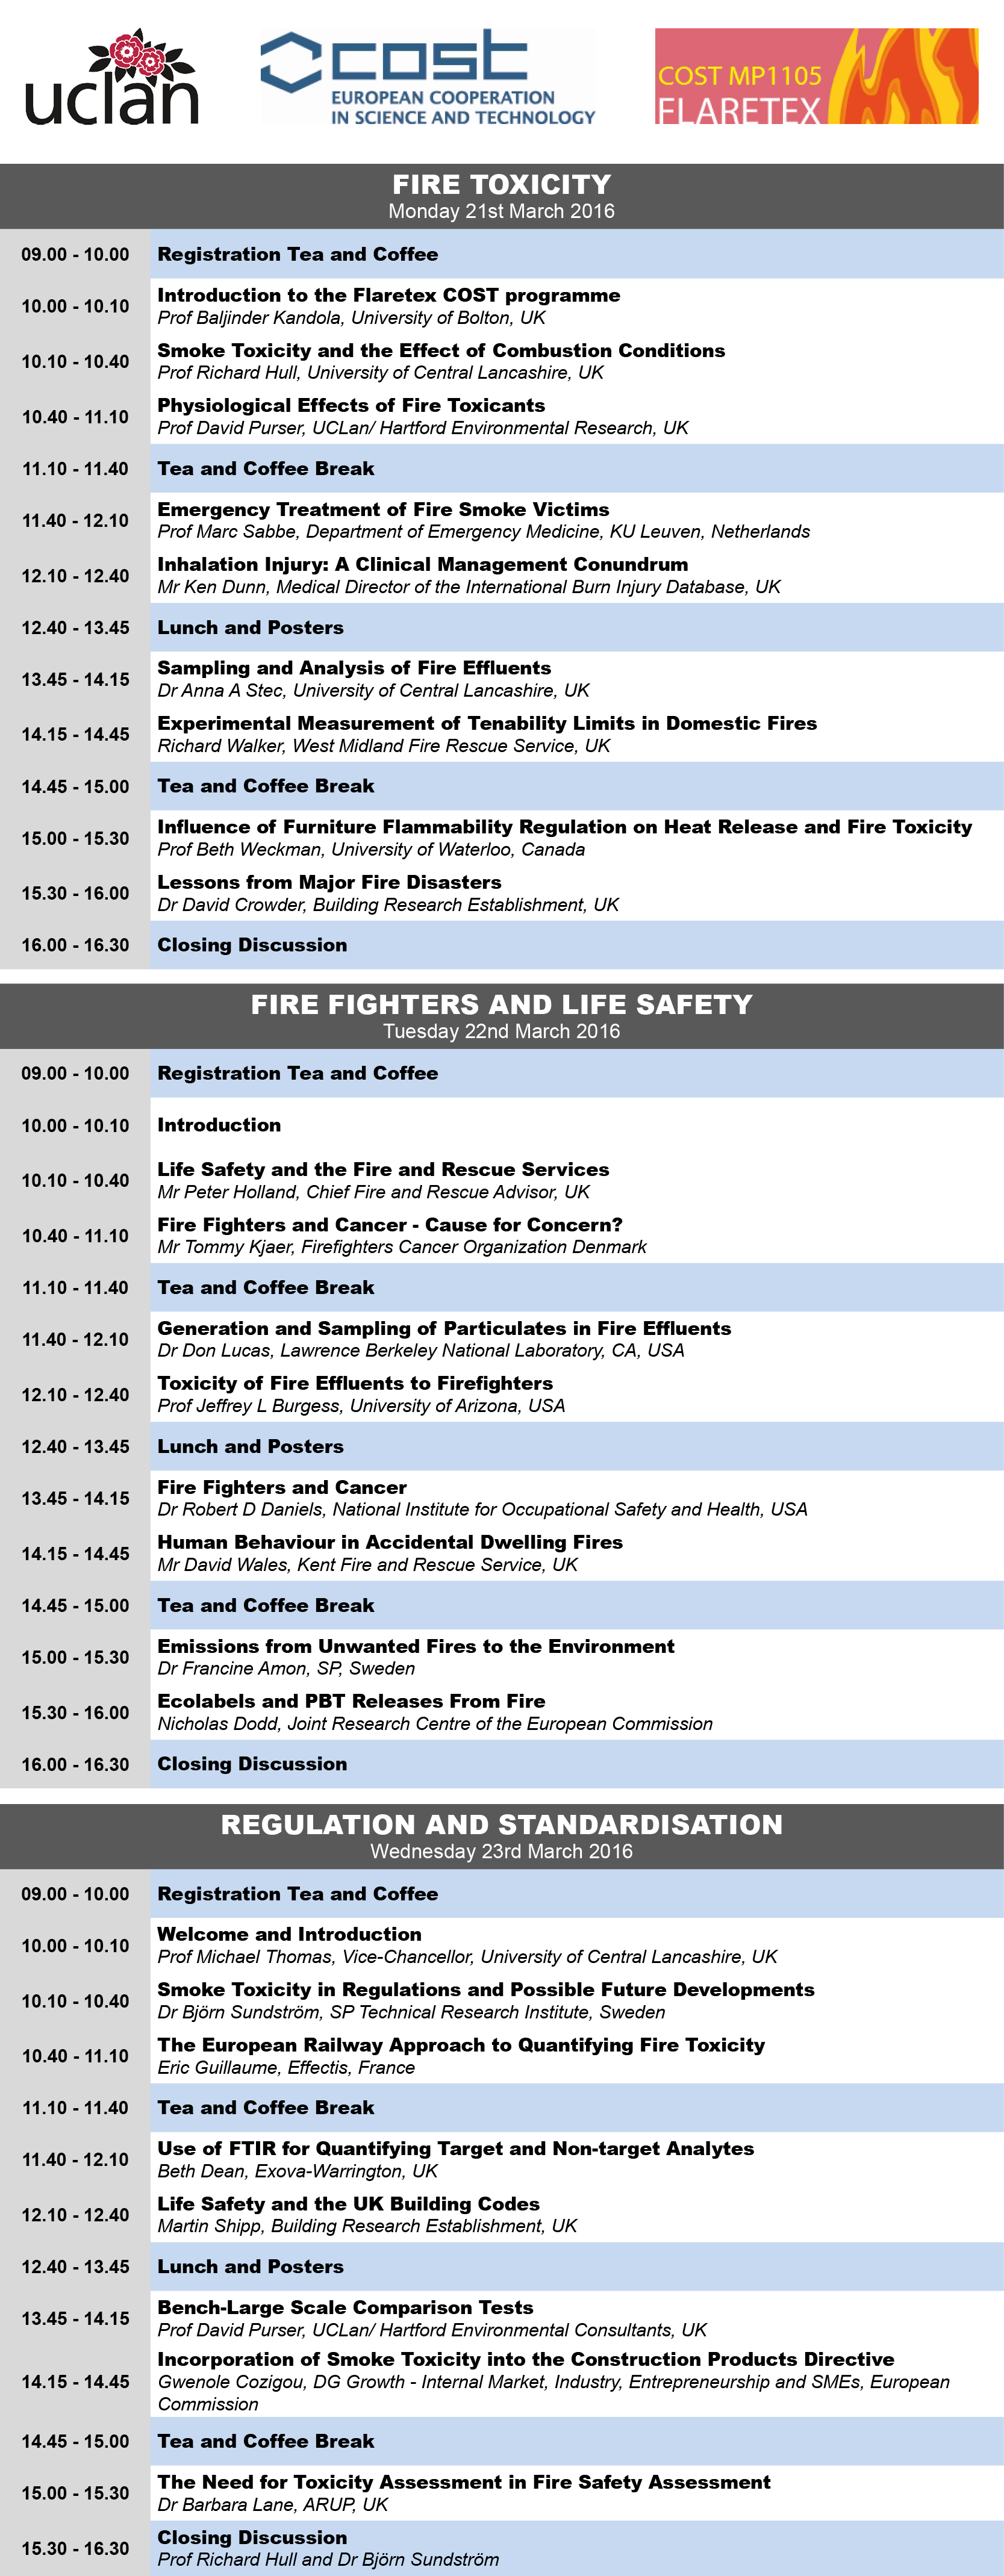 Fire Toxicity 2016 Programme